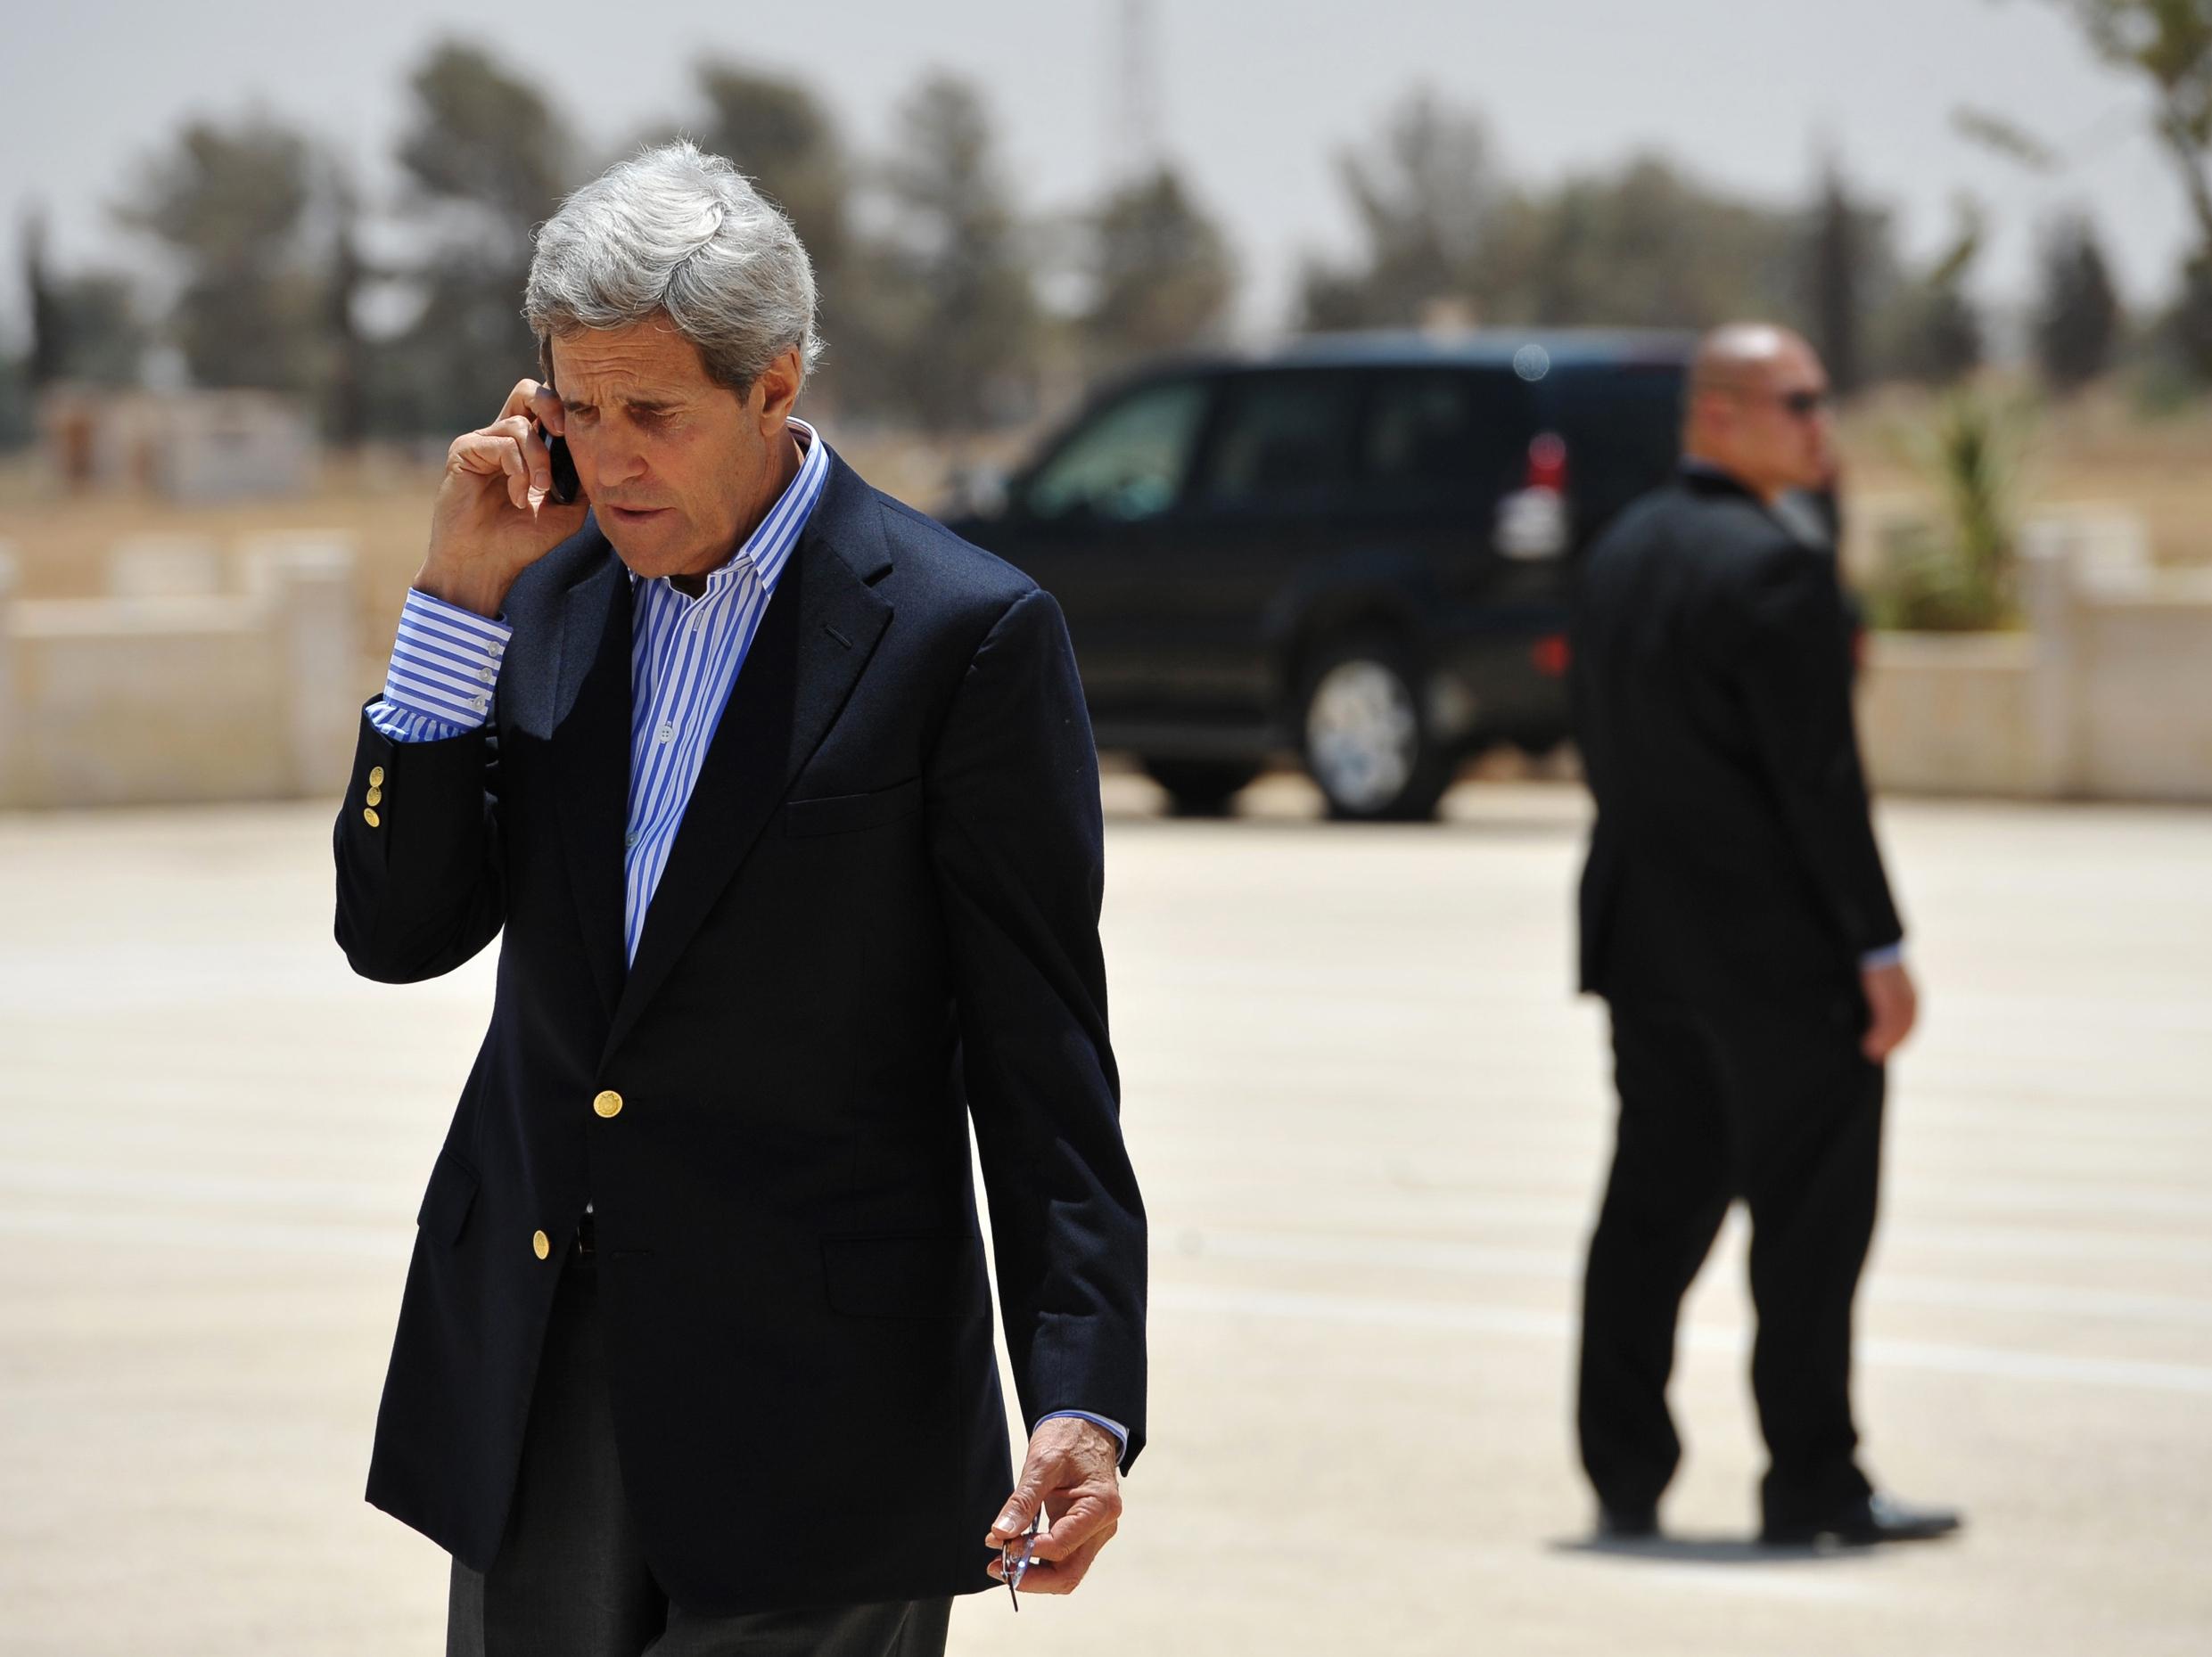 Germany Eavesdropped On Kerry, Clinton, Magazine Says